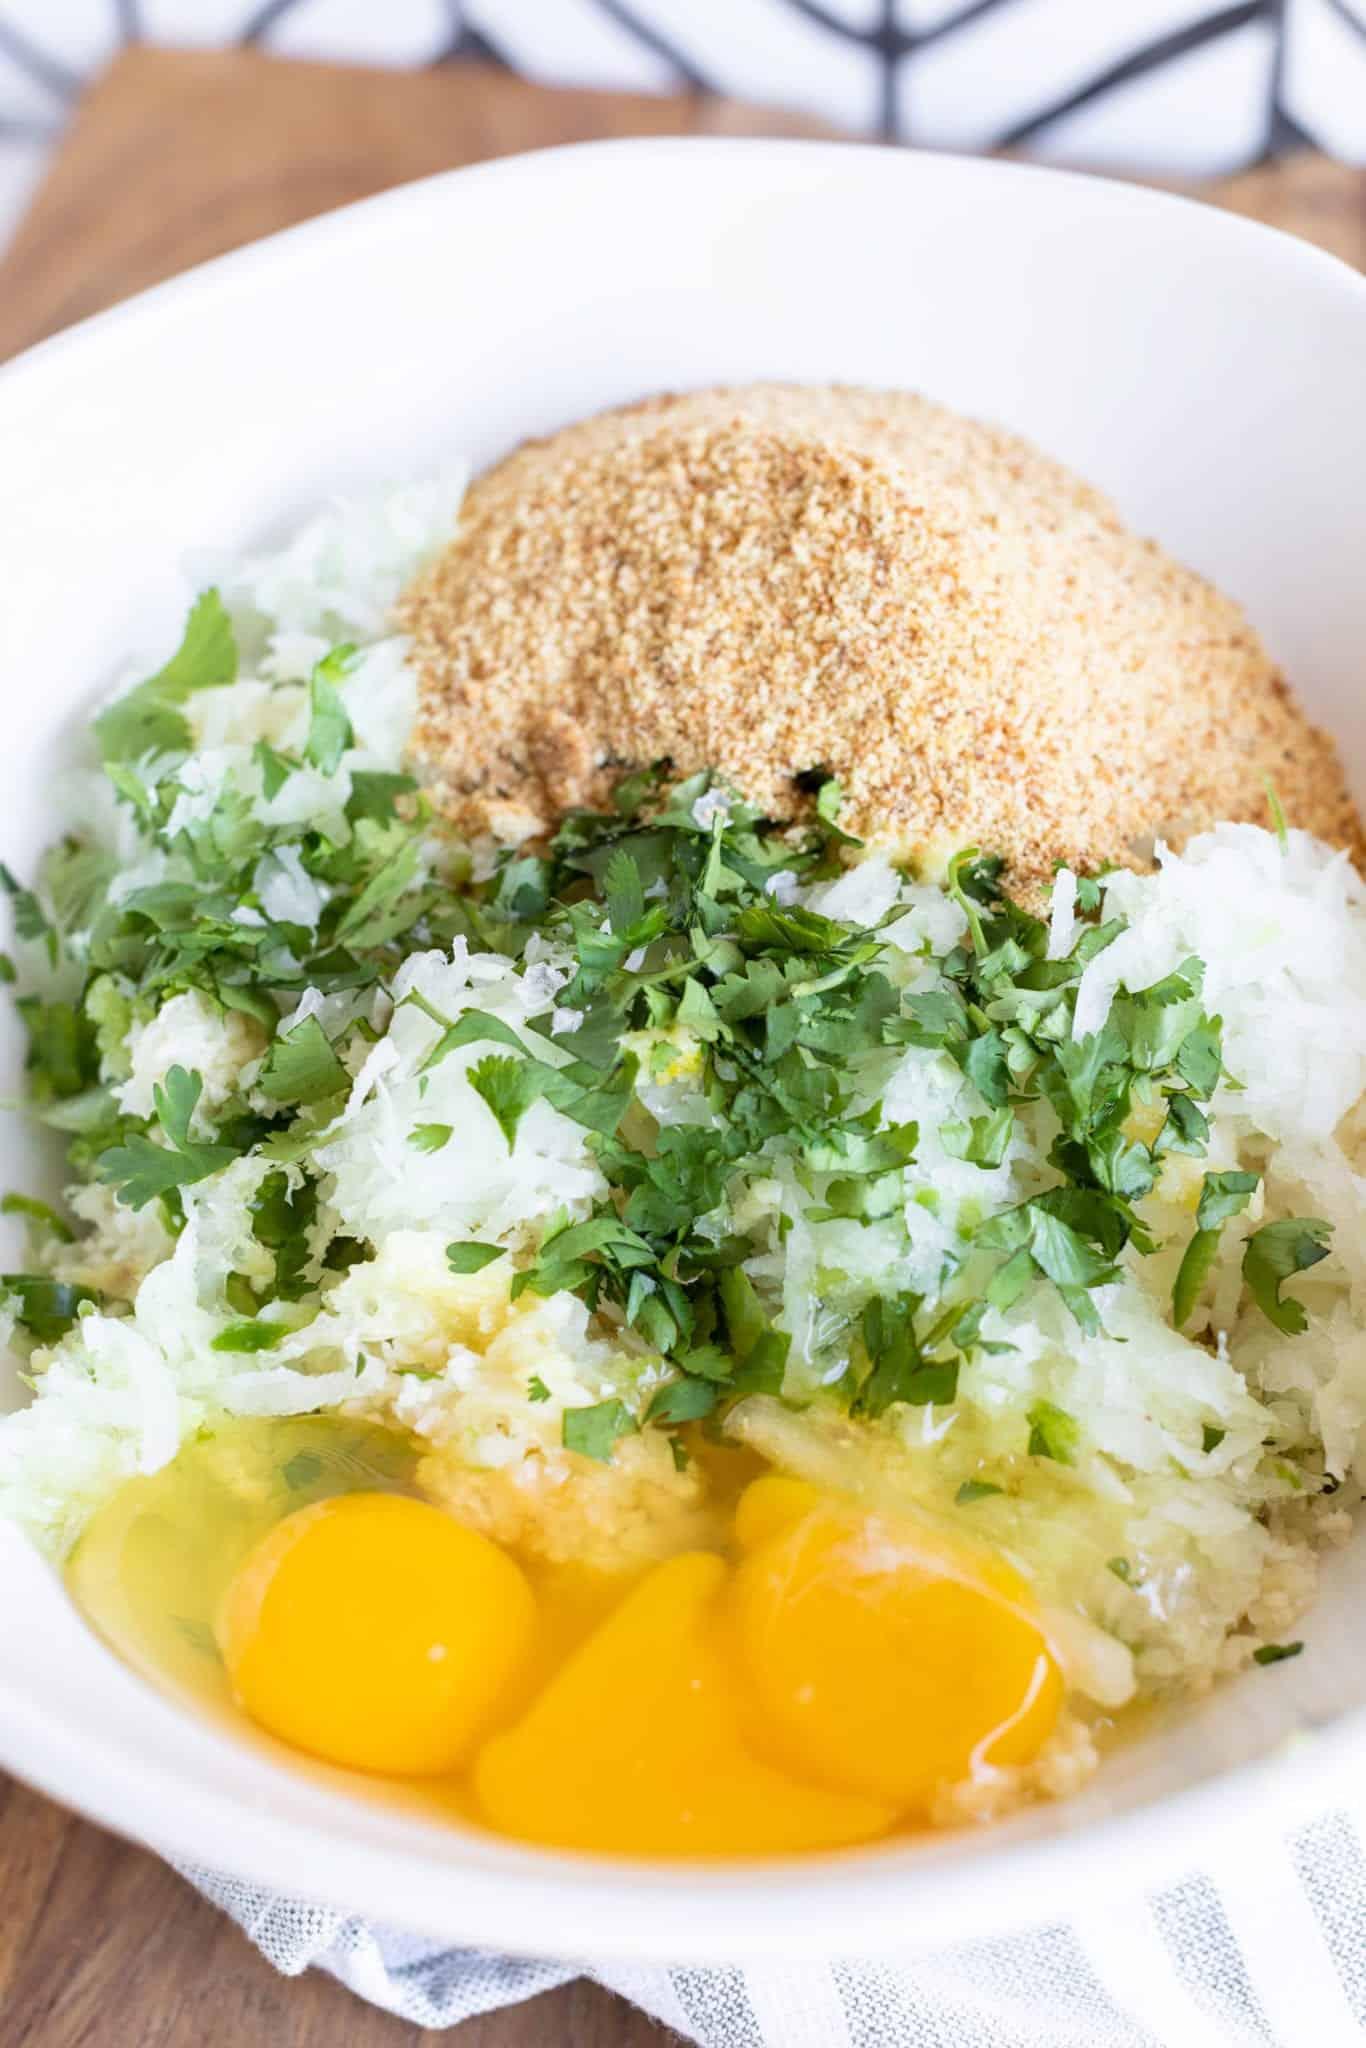 cauliflower, onion, jalapeño, garlic, egg, breadcrumb, flour, sea salt flakes and fresh parsley for crispy cauliflower hash browns all ready to mix